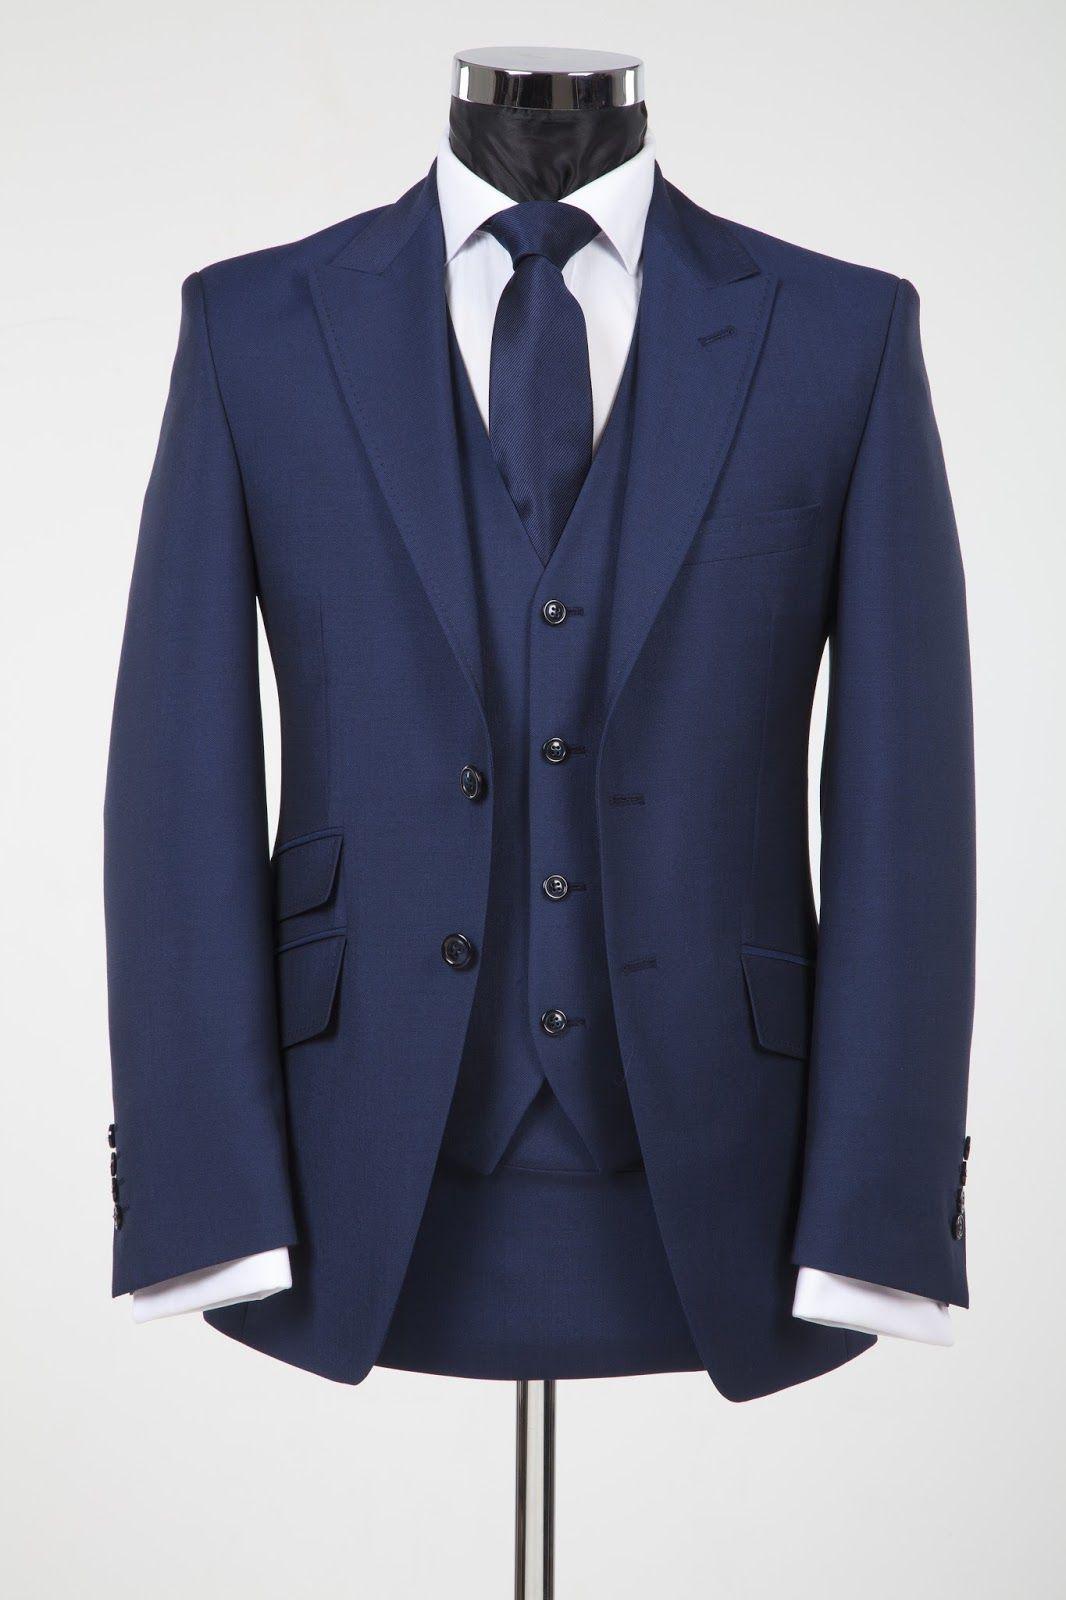 The Bunney Blog: 2014 - Men\'s Wedding Fashion - Trends - What ...